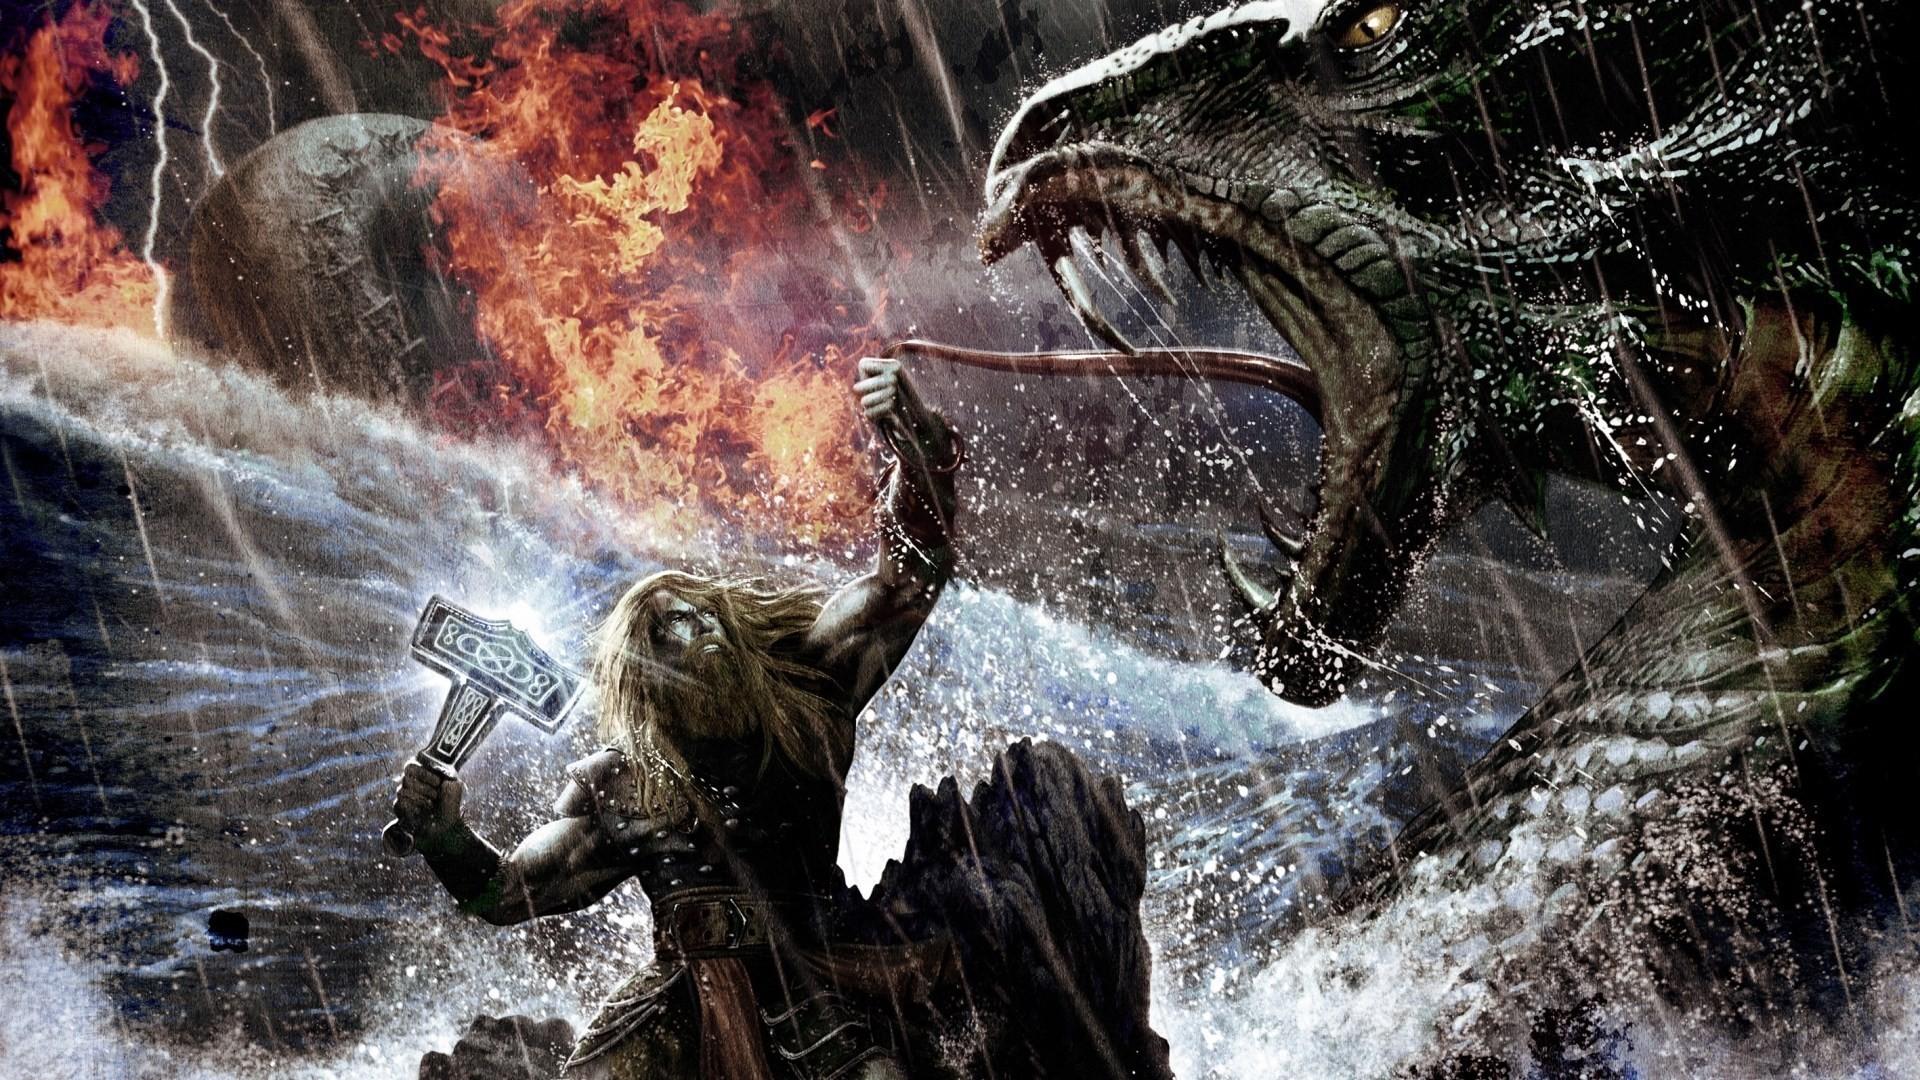 warrior, Amon Amarth, Melodic death metal, Vikings, Battle, Fantasy Battle,  Digital art, Fantasy art, Death metal, Viking metal, Viking death metal, …